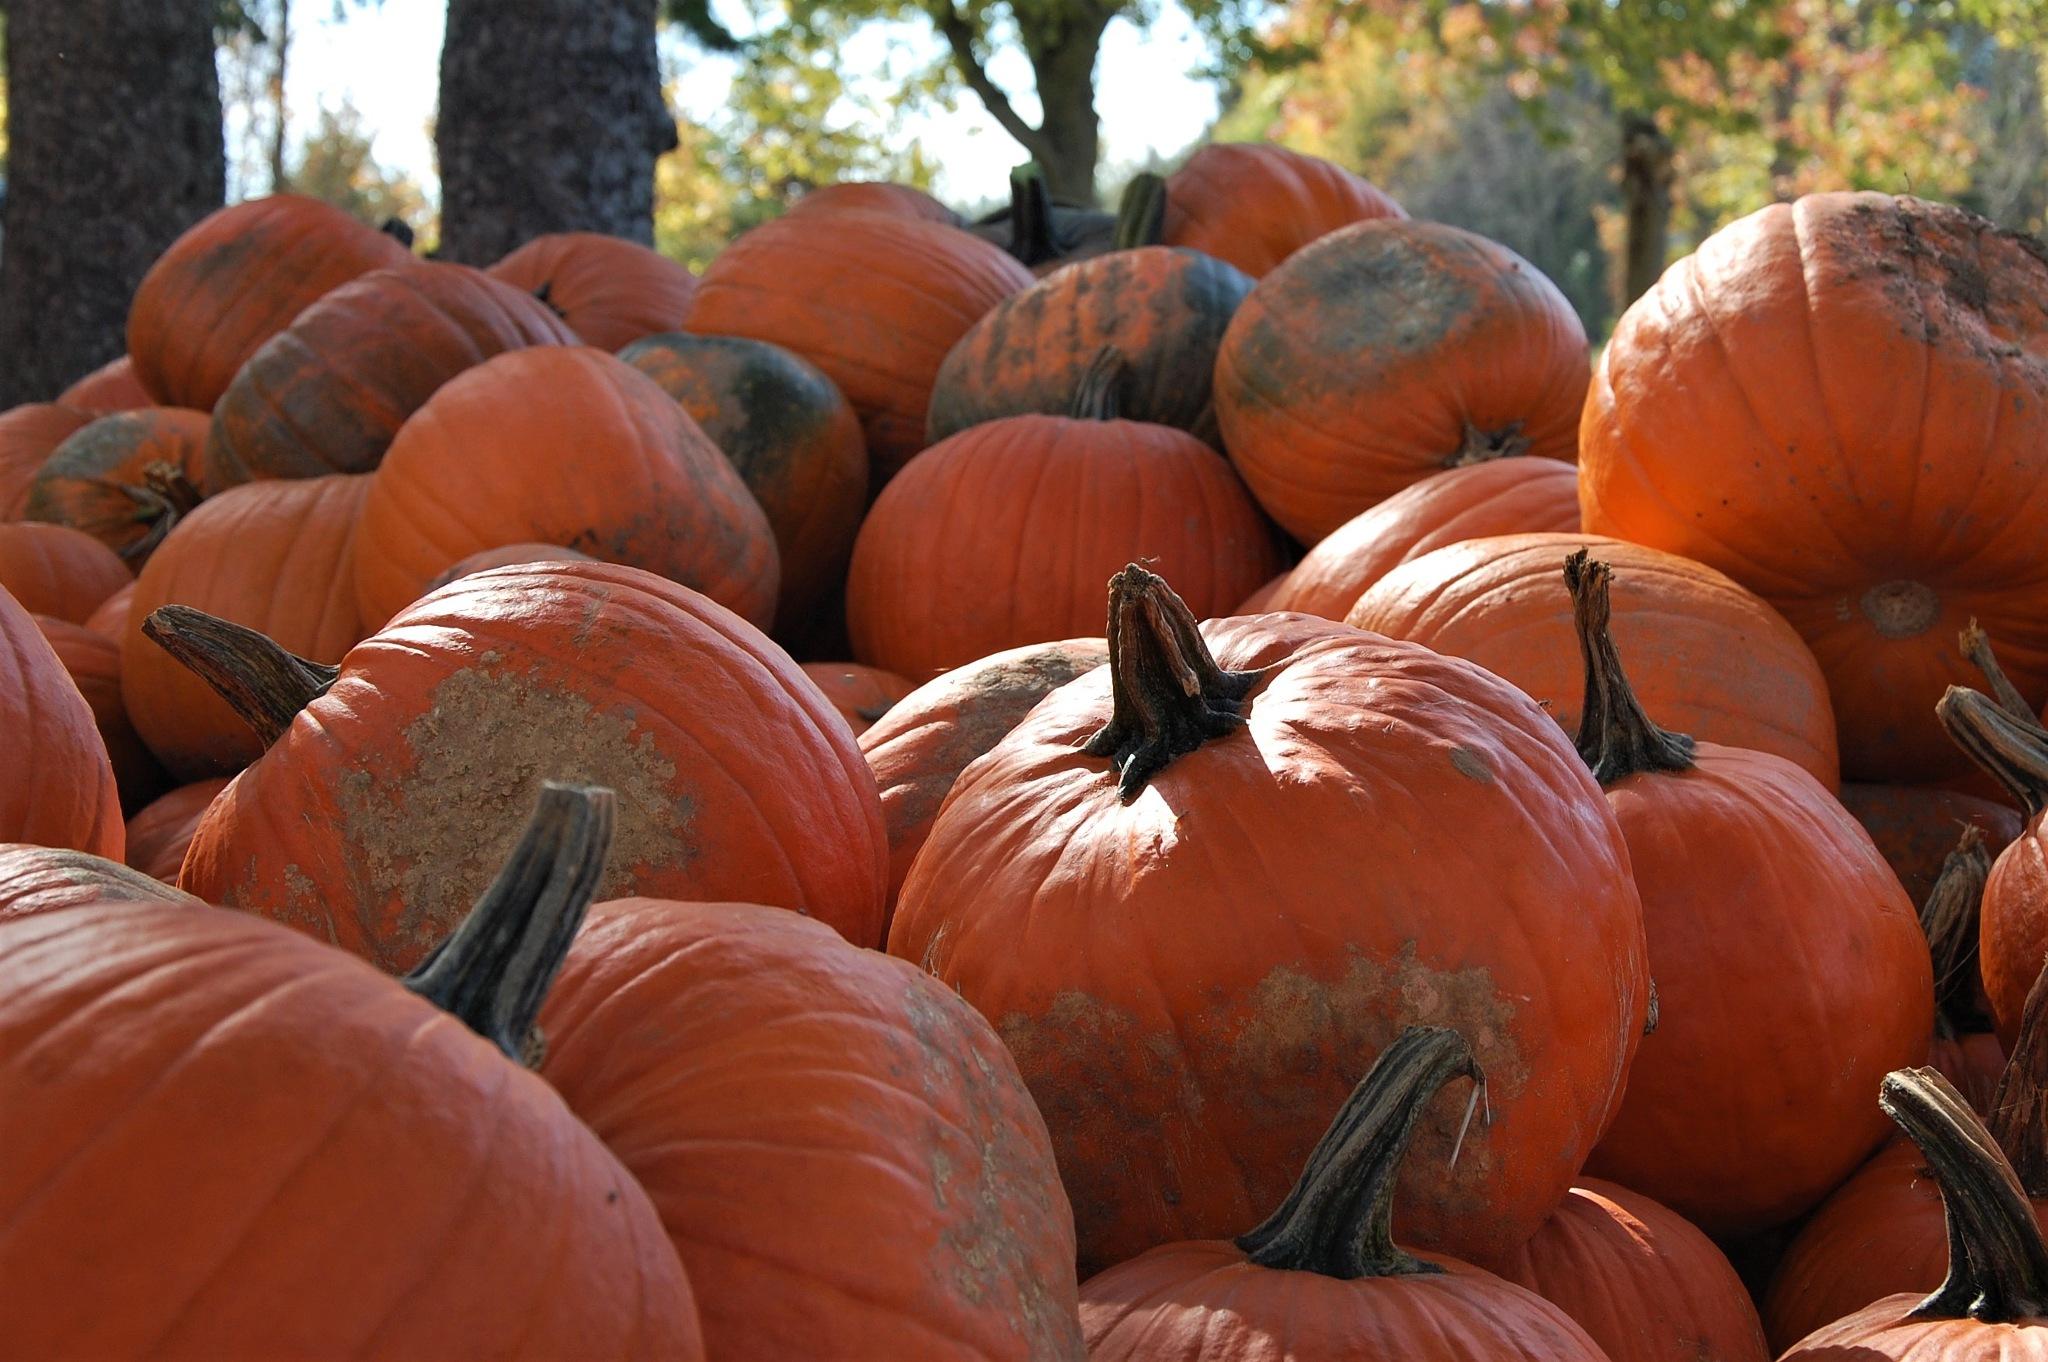 Pumpkin patch by CindyLou